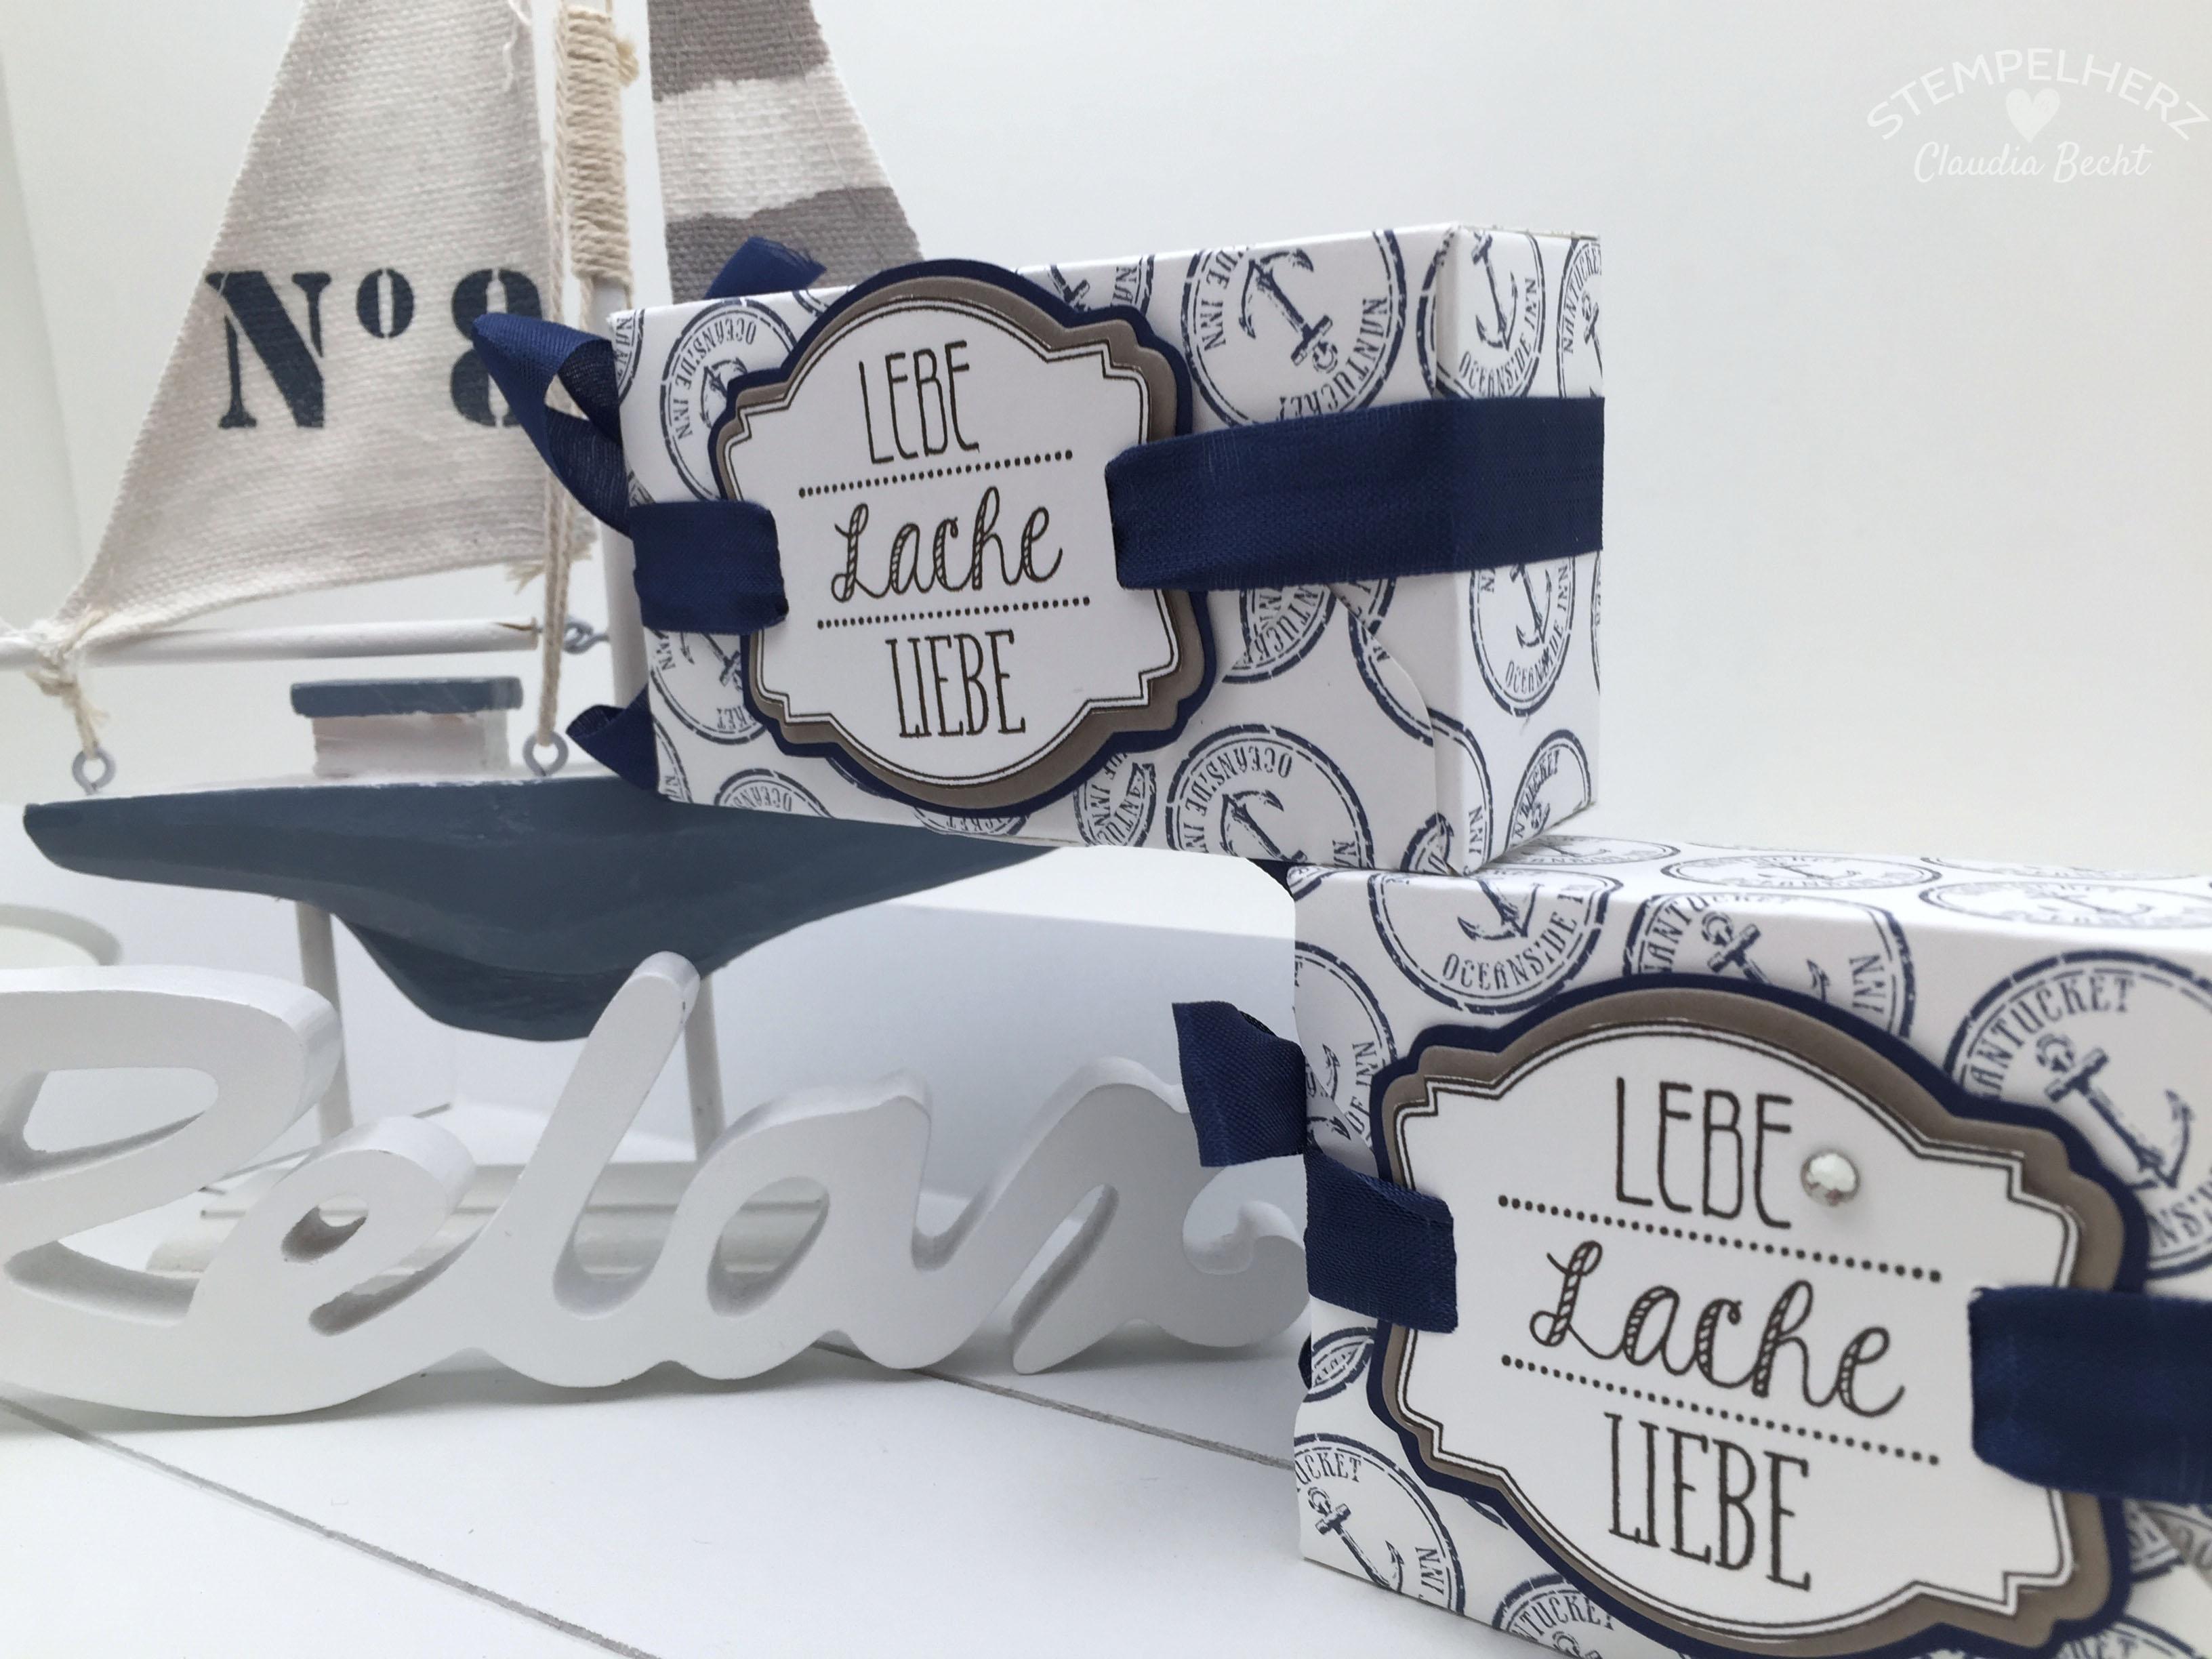 Stampin Up-Stempelherz-Boxen-Verpackung-Ach du meine Gruesse-By the Tide-Verpackung Lebe Lache Liebe 02